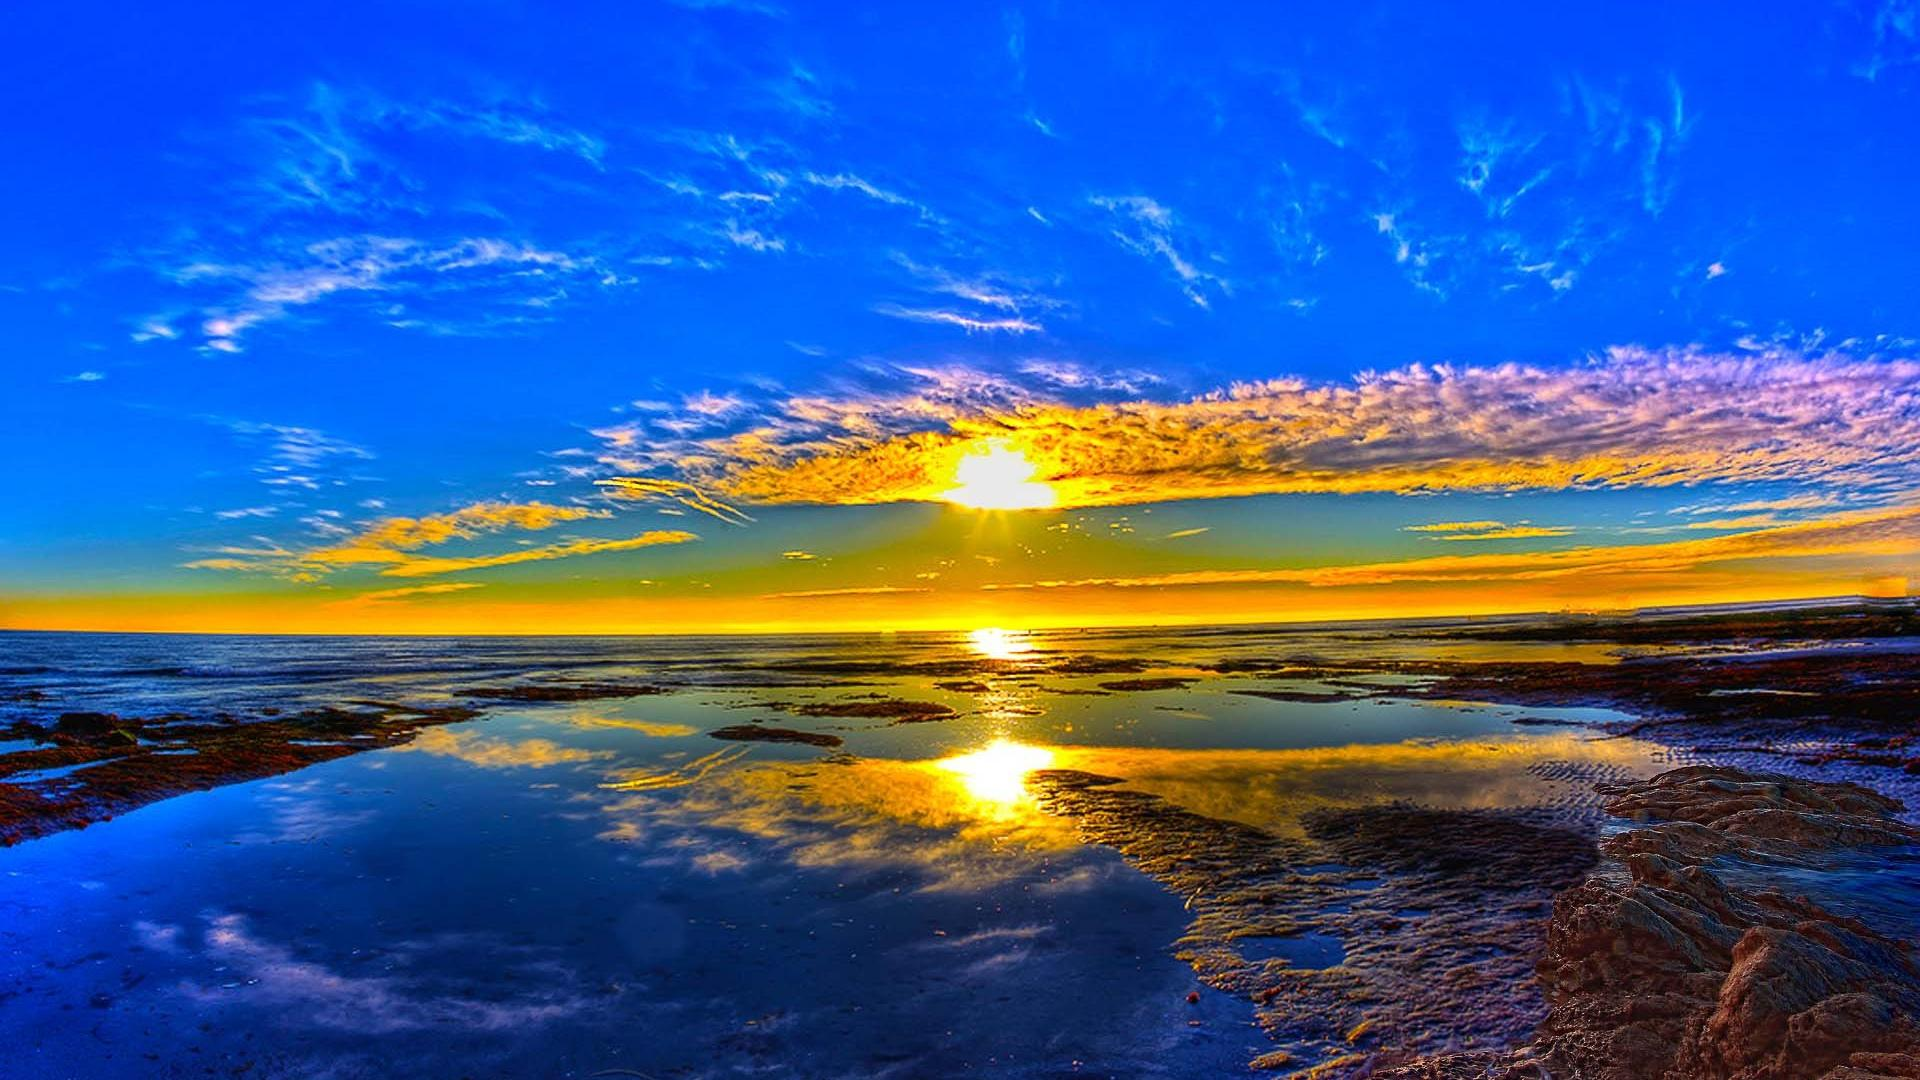 Sunrise Wallpaper · Sunrise Wallpaper · Sunrise Wallpaper ...